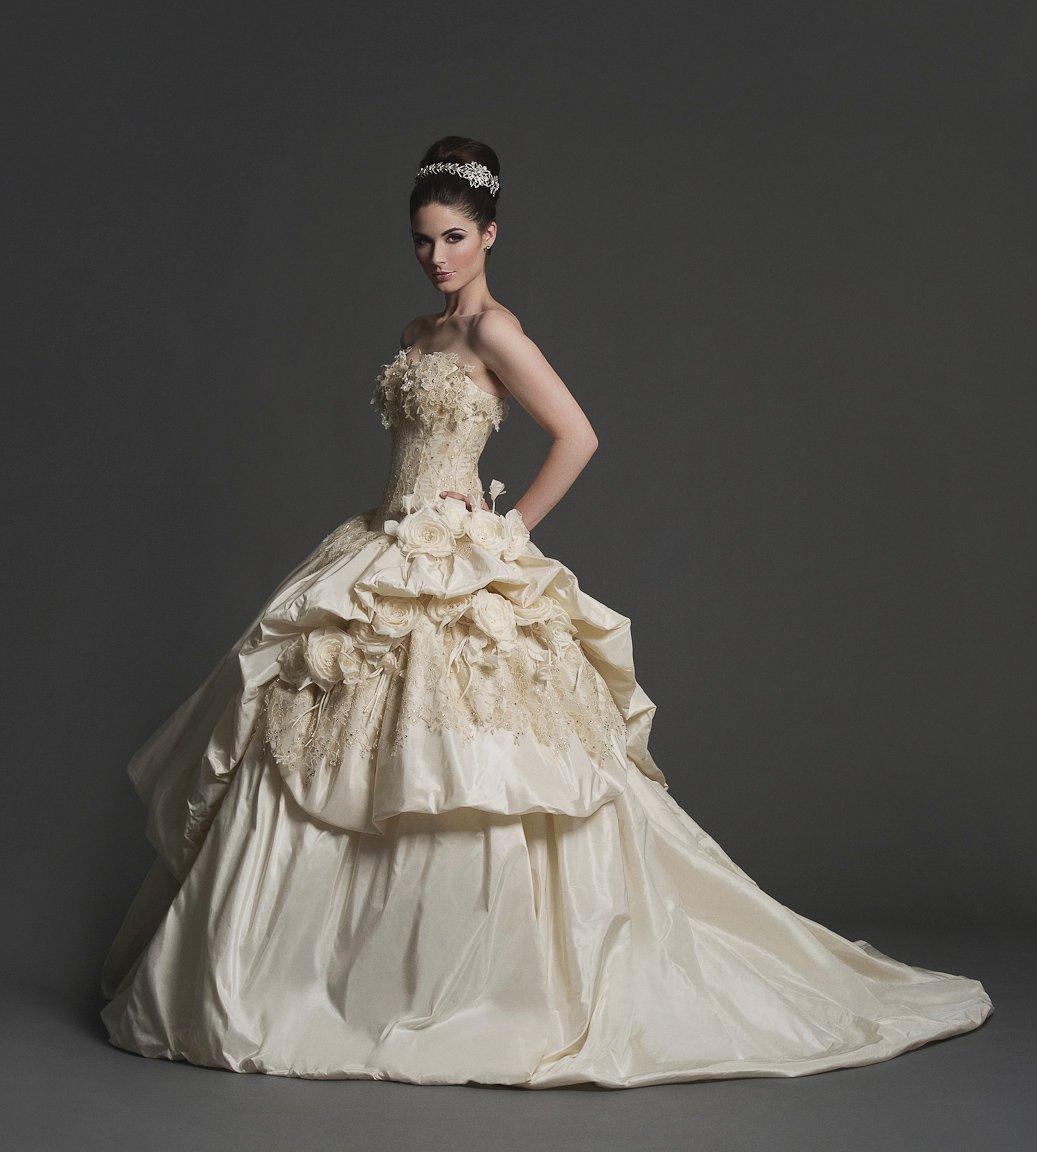 Katerina bocci bridal reviews ratings wedding dress for Wedding dresses in michigan